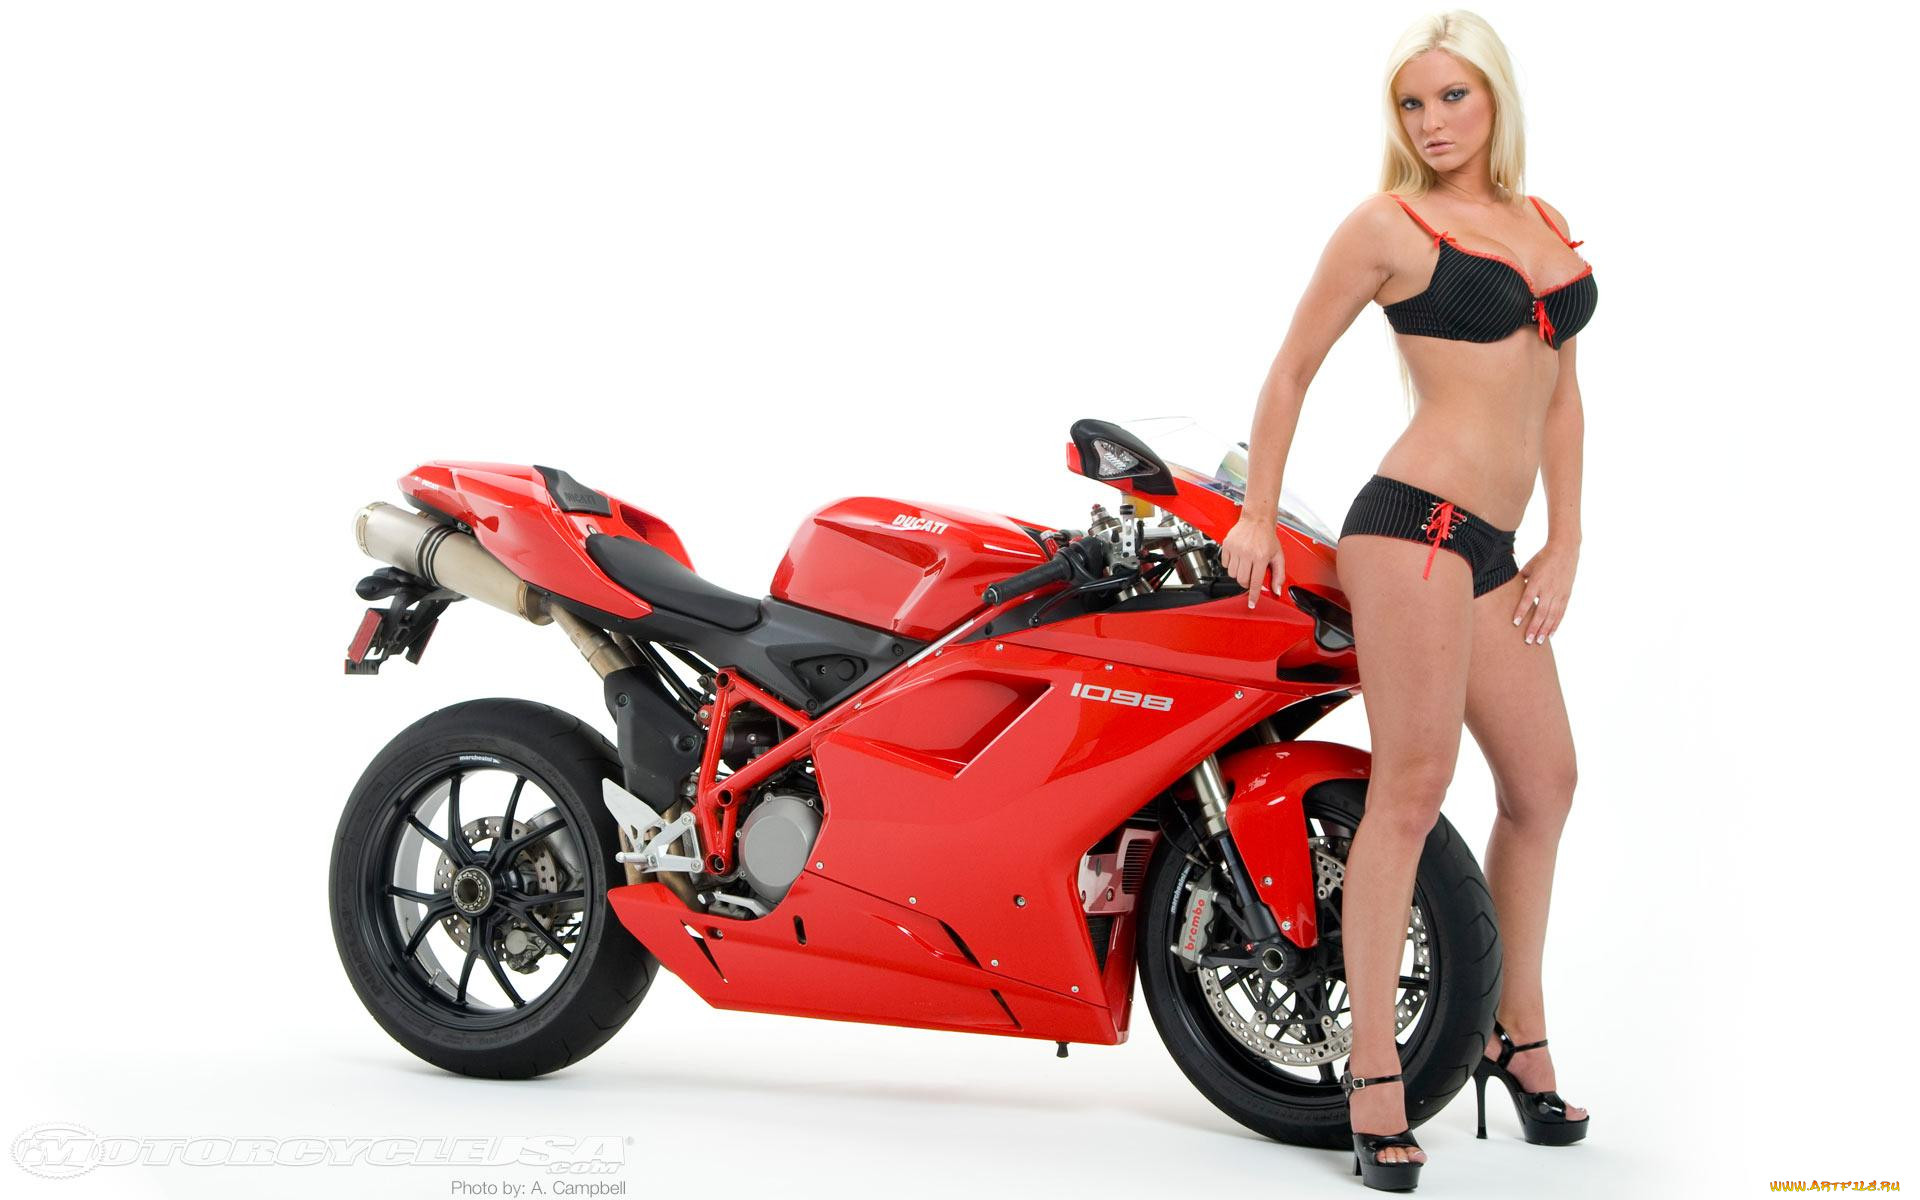 holly, ann, with, ducati, 1098, мотоциклы, мото, девушкой